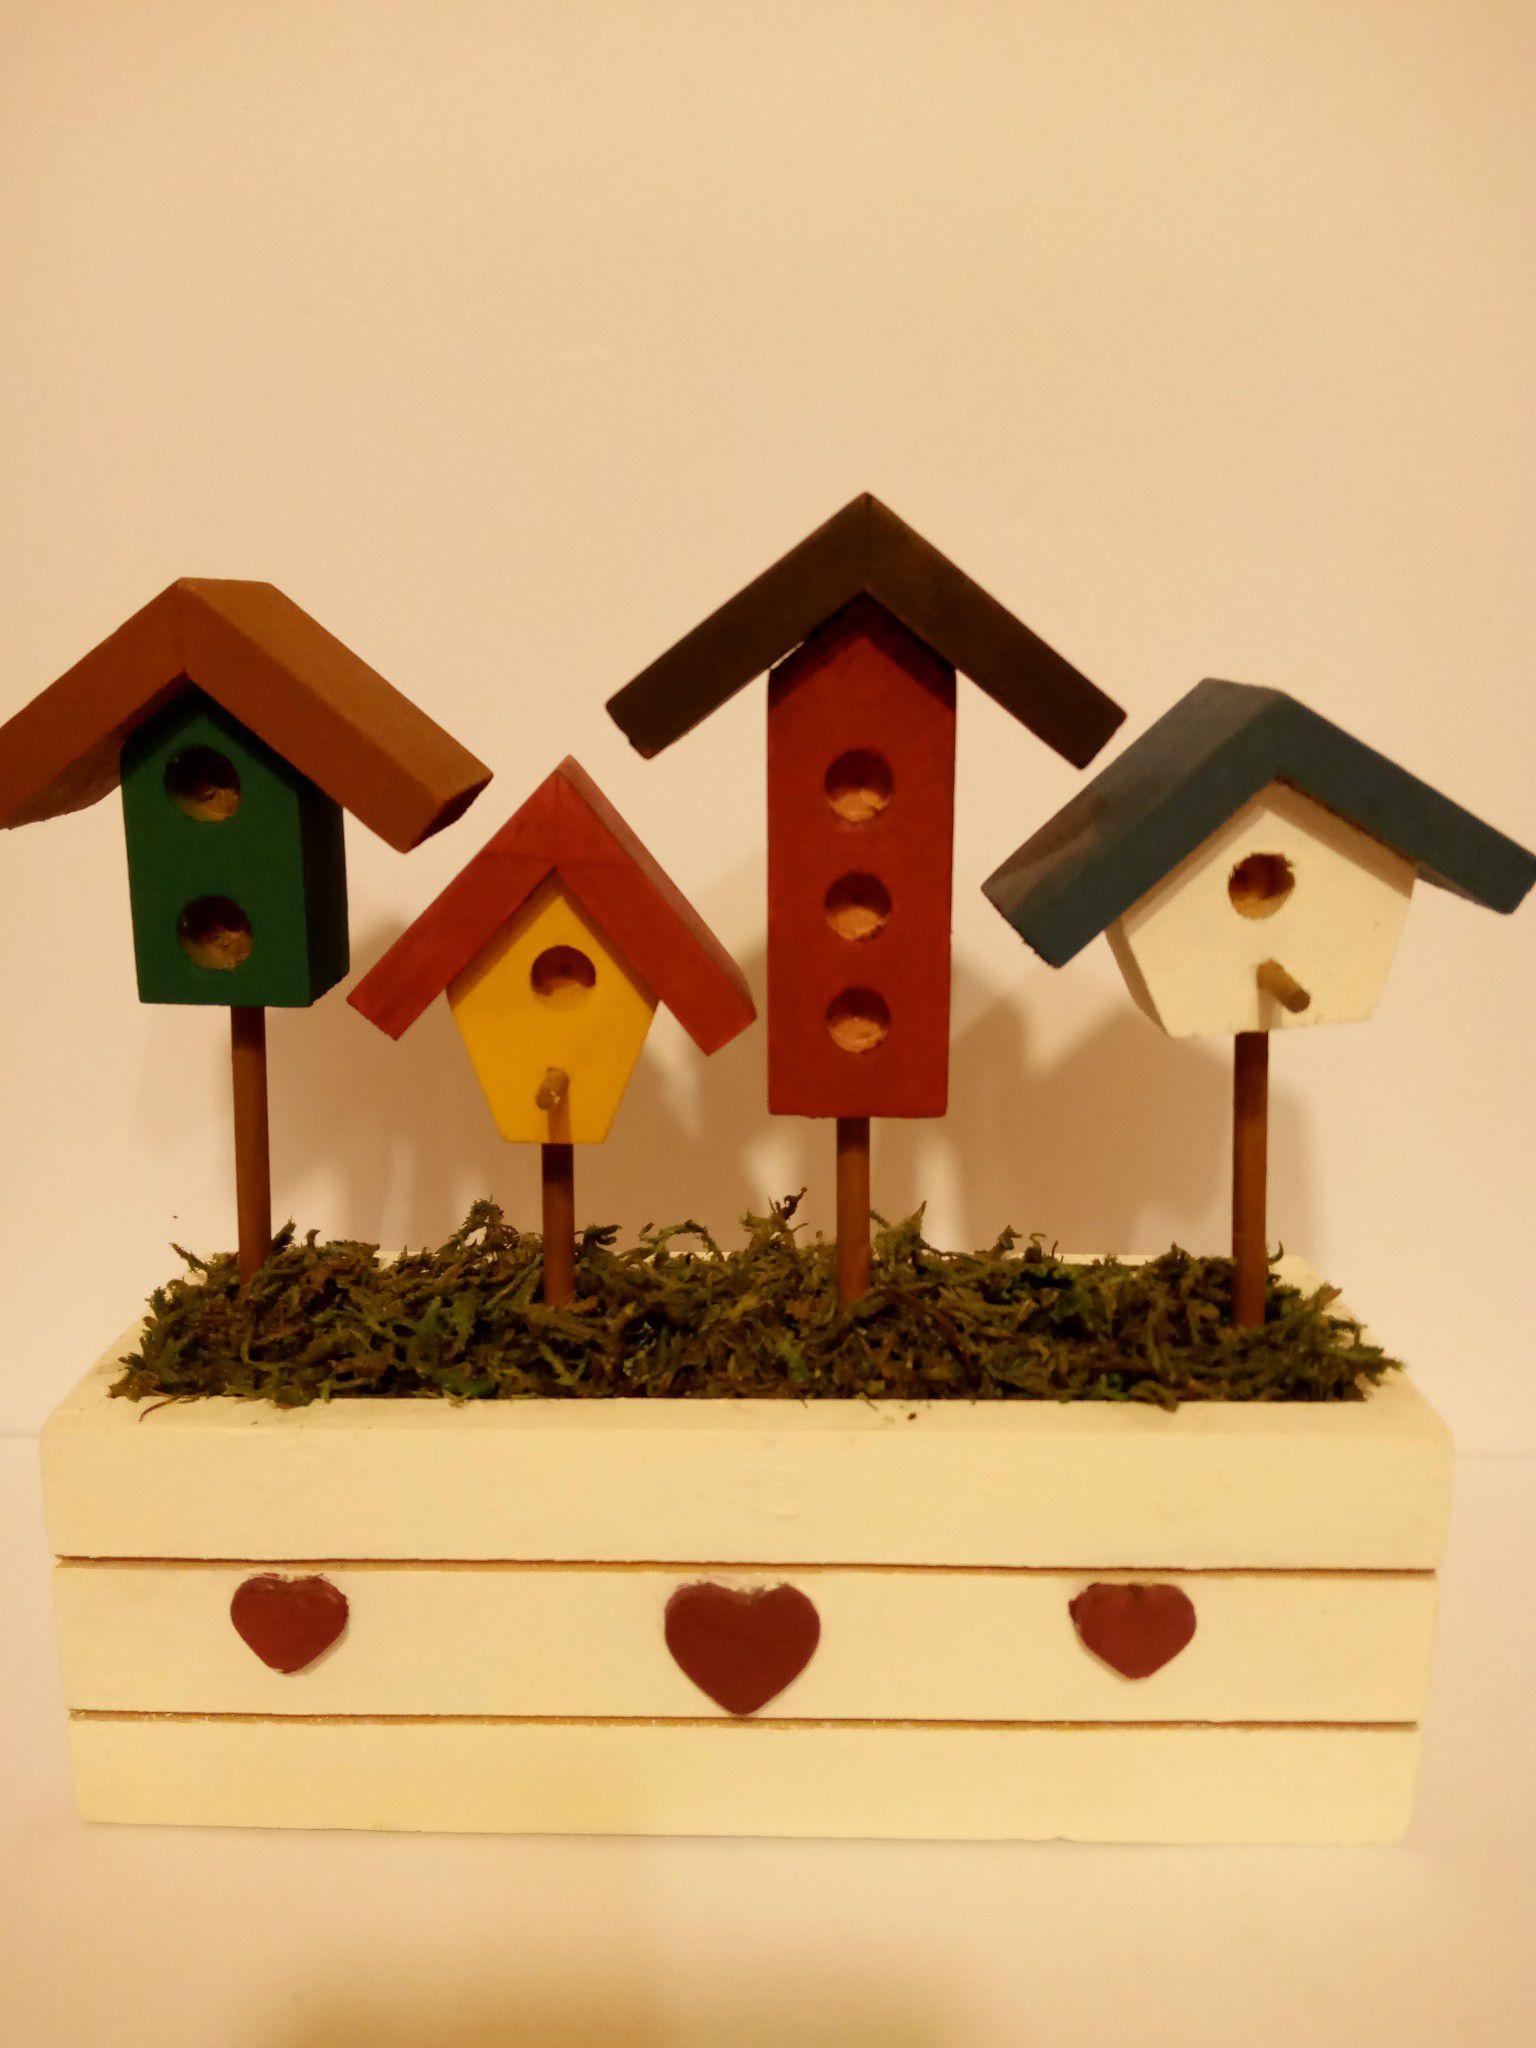 Whimsical music box